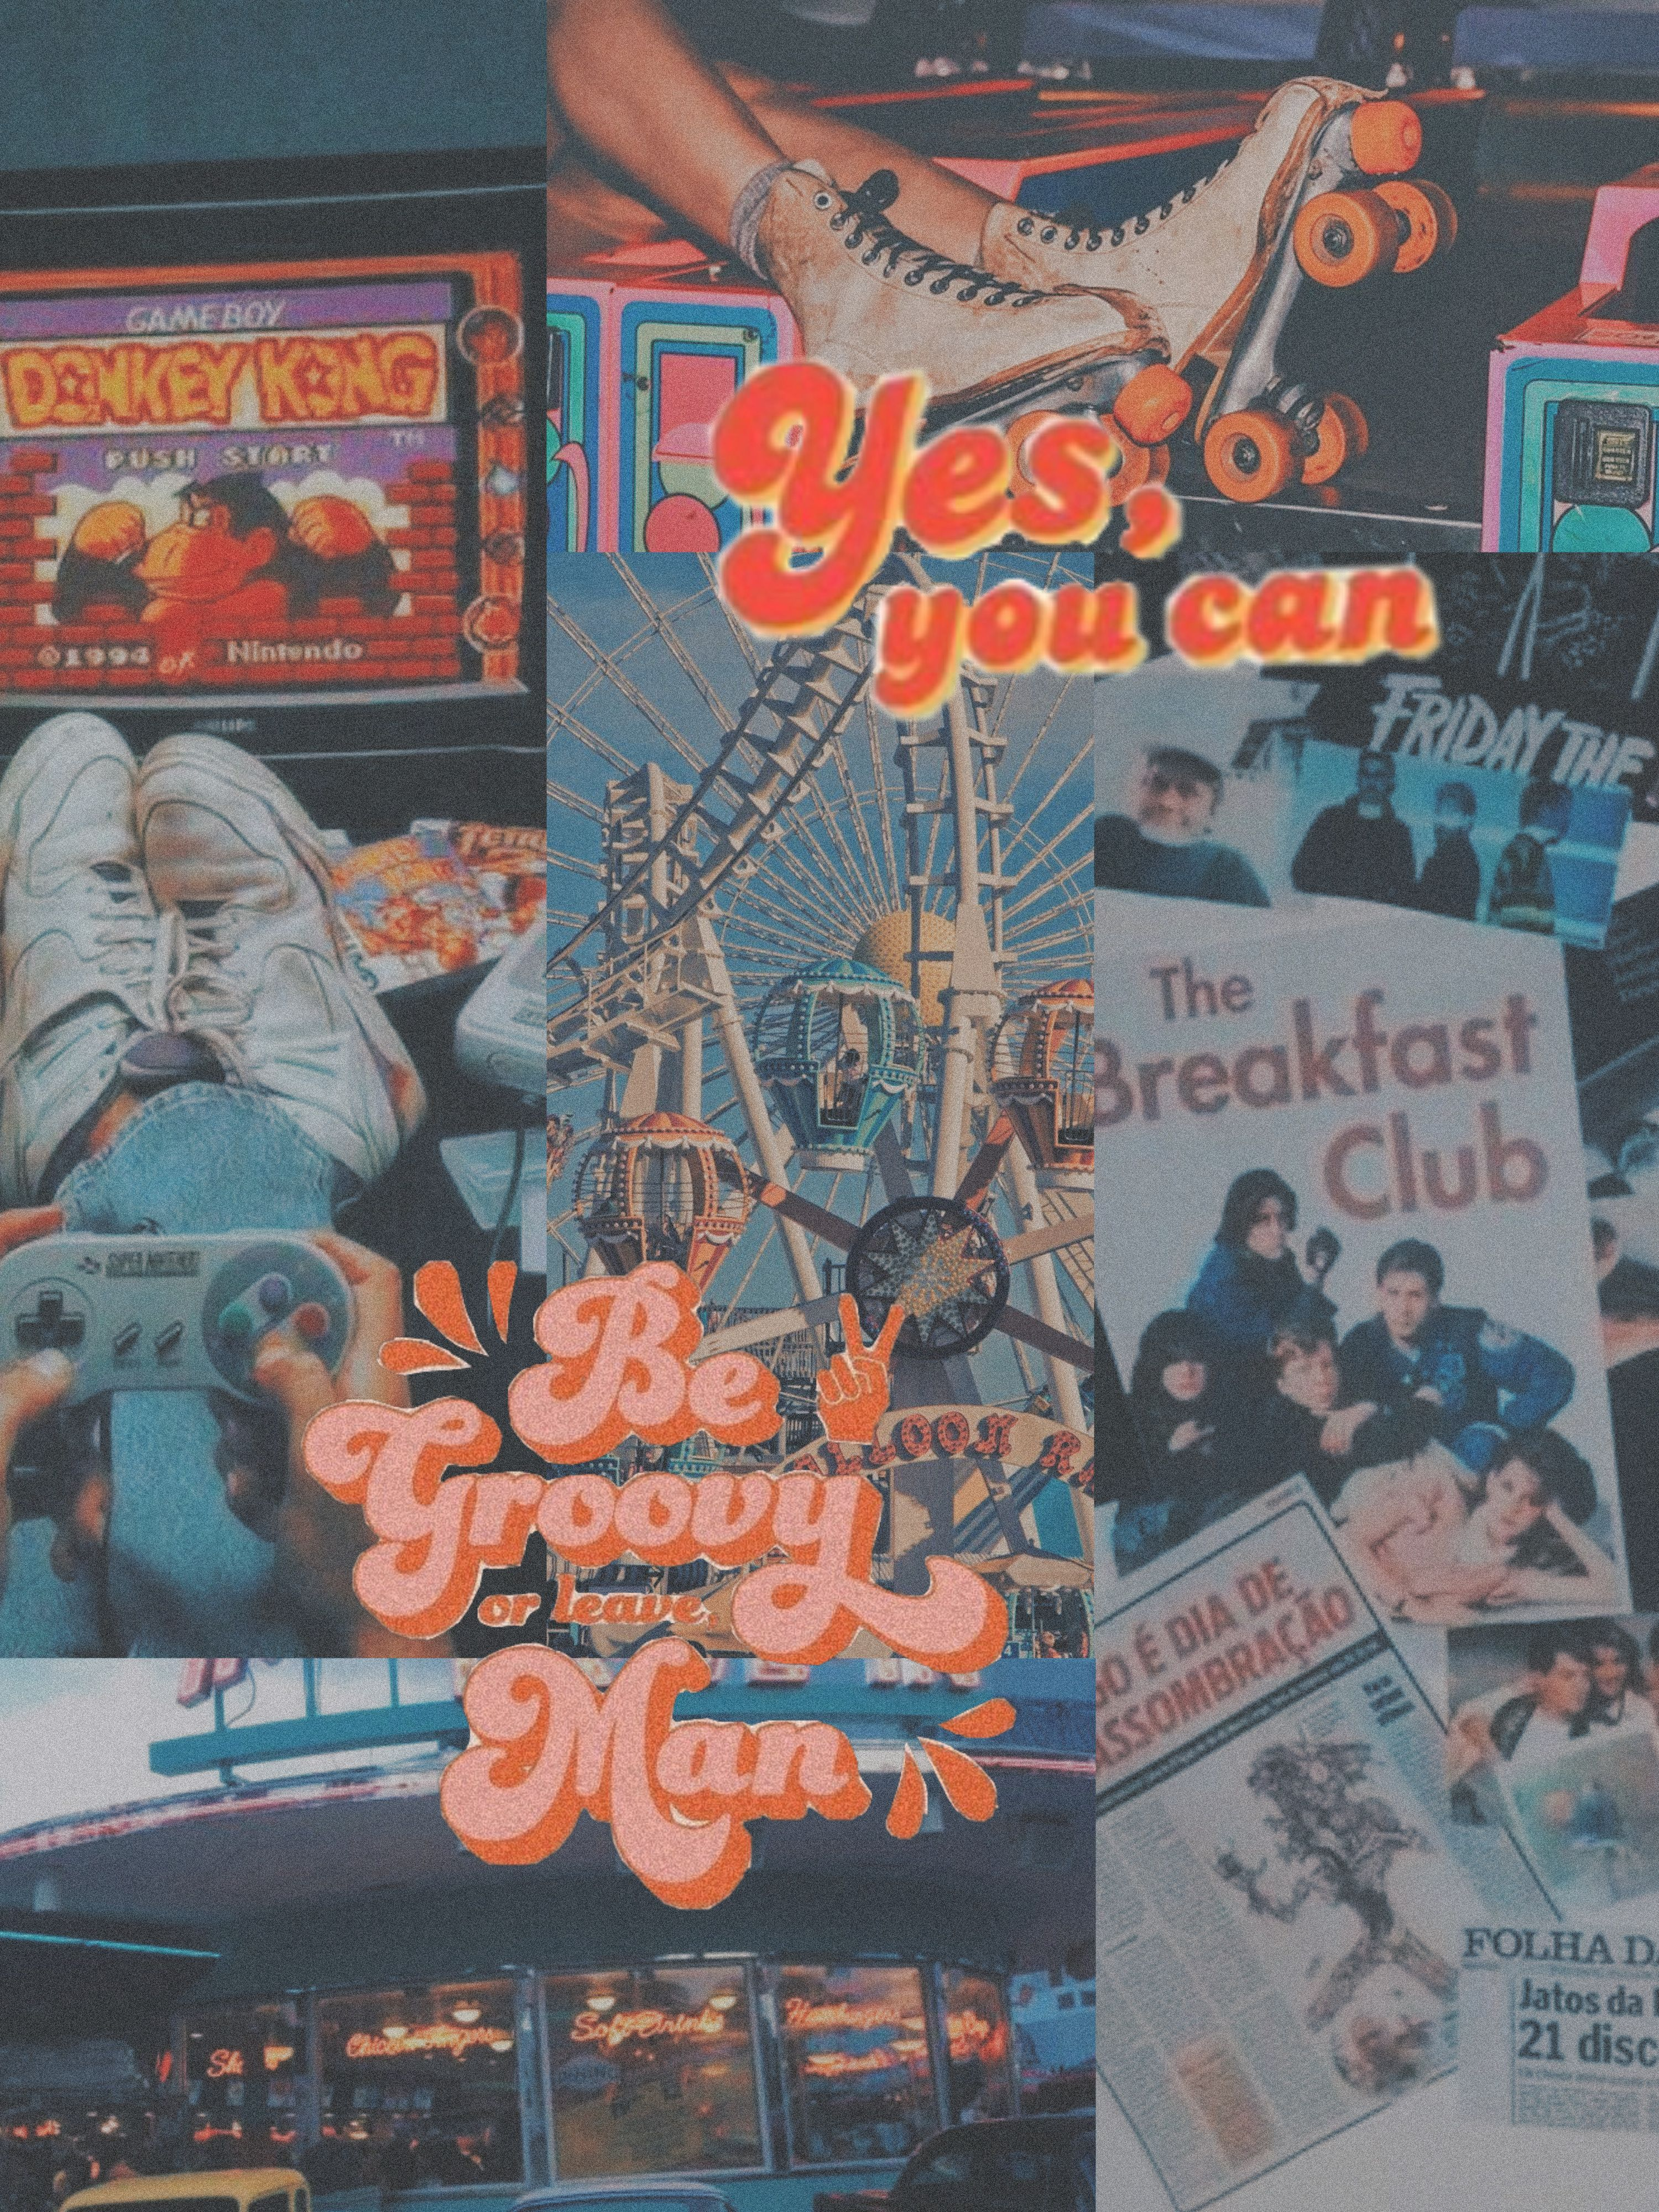 Retro Wallpaper 80s Vintage 90s Aesthetics Retro Wallpaper Iphone Wallpapers Vintage Iphone Wallpaper Vintage